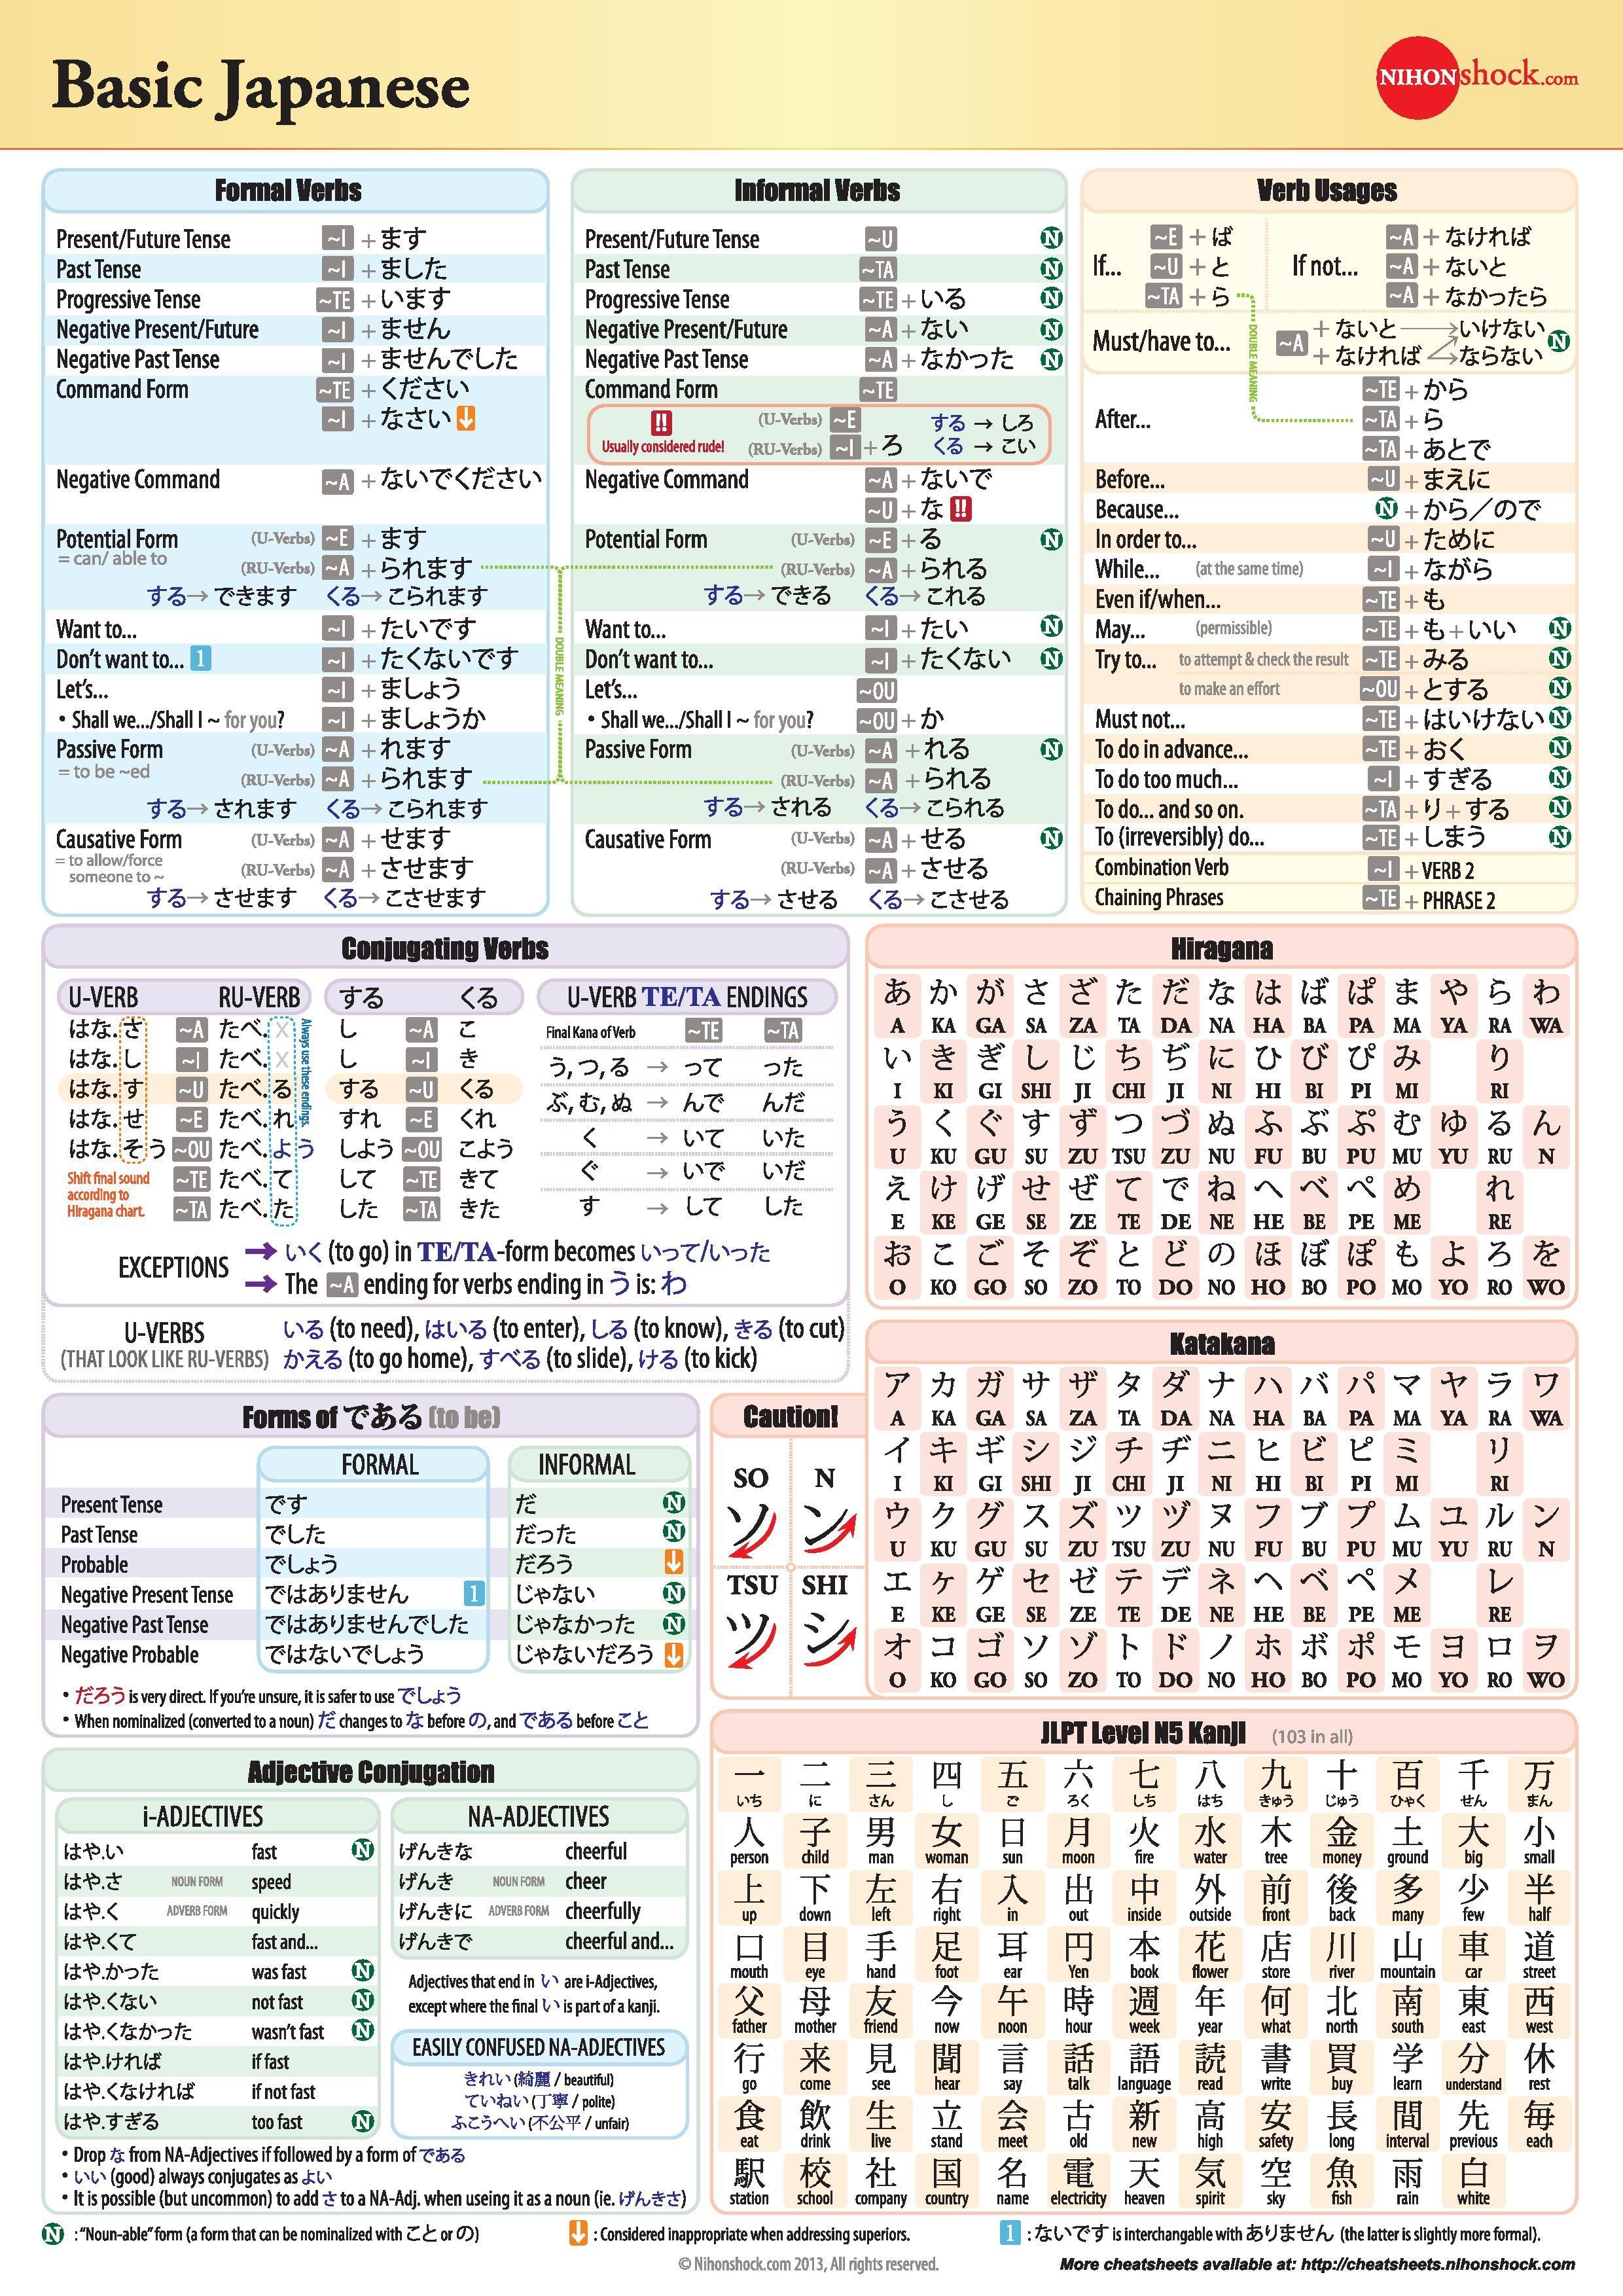 Basic Japanese Grammar Chart Japanese Language Grammar